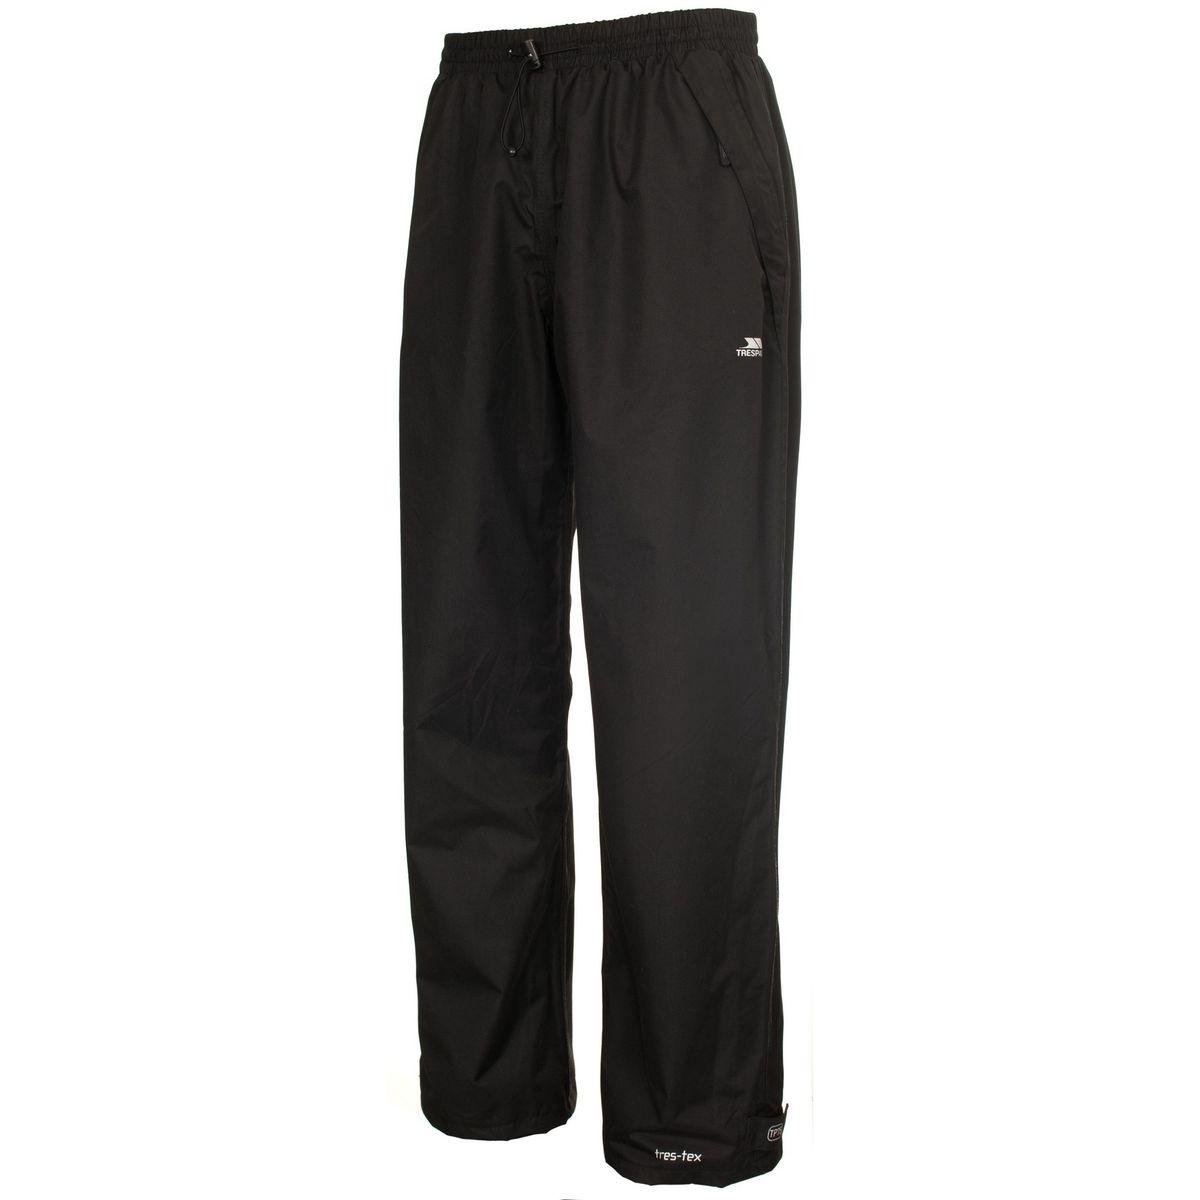 Toliland pantalon imperméable